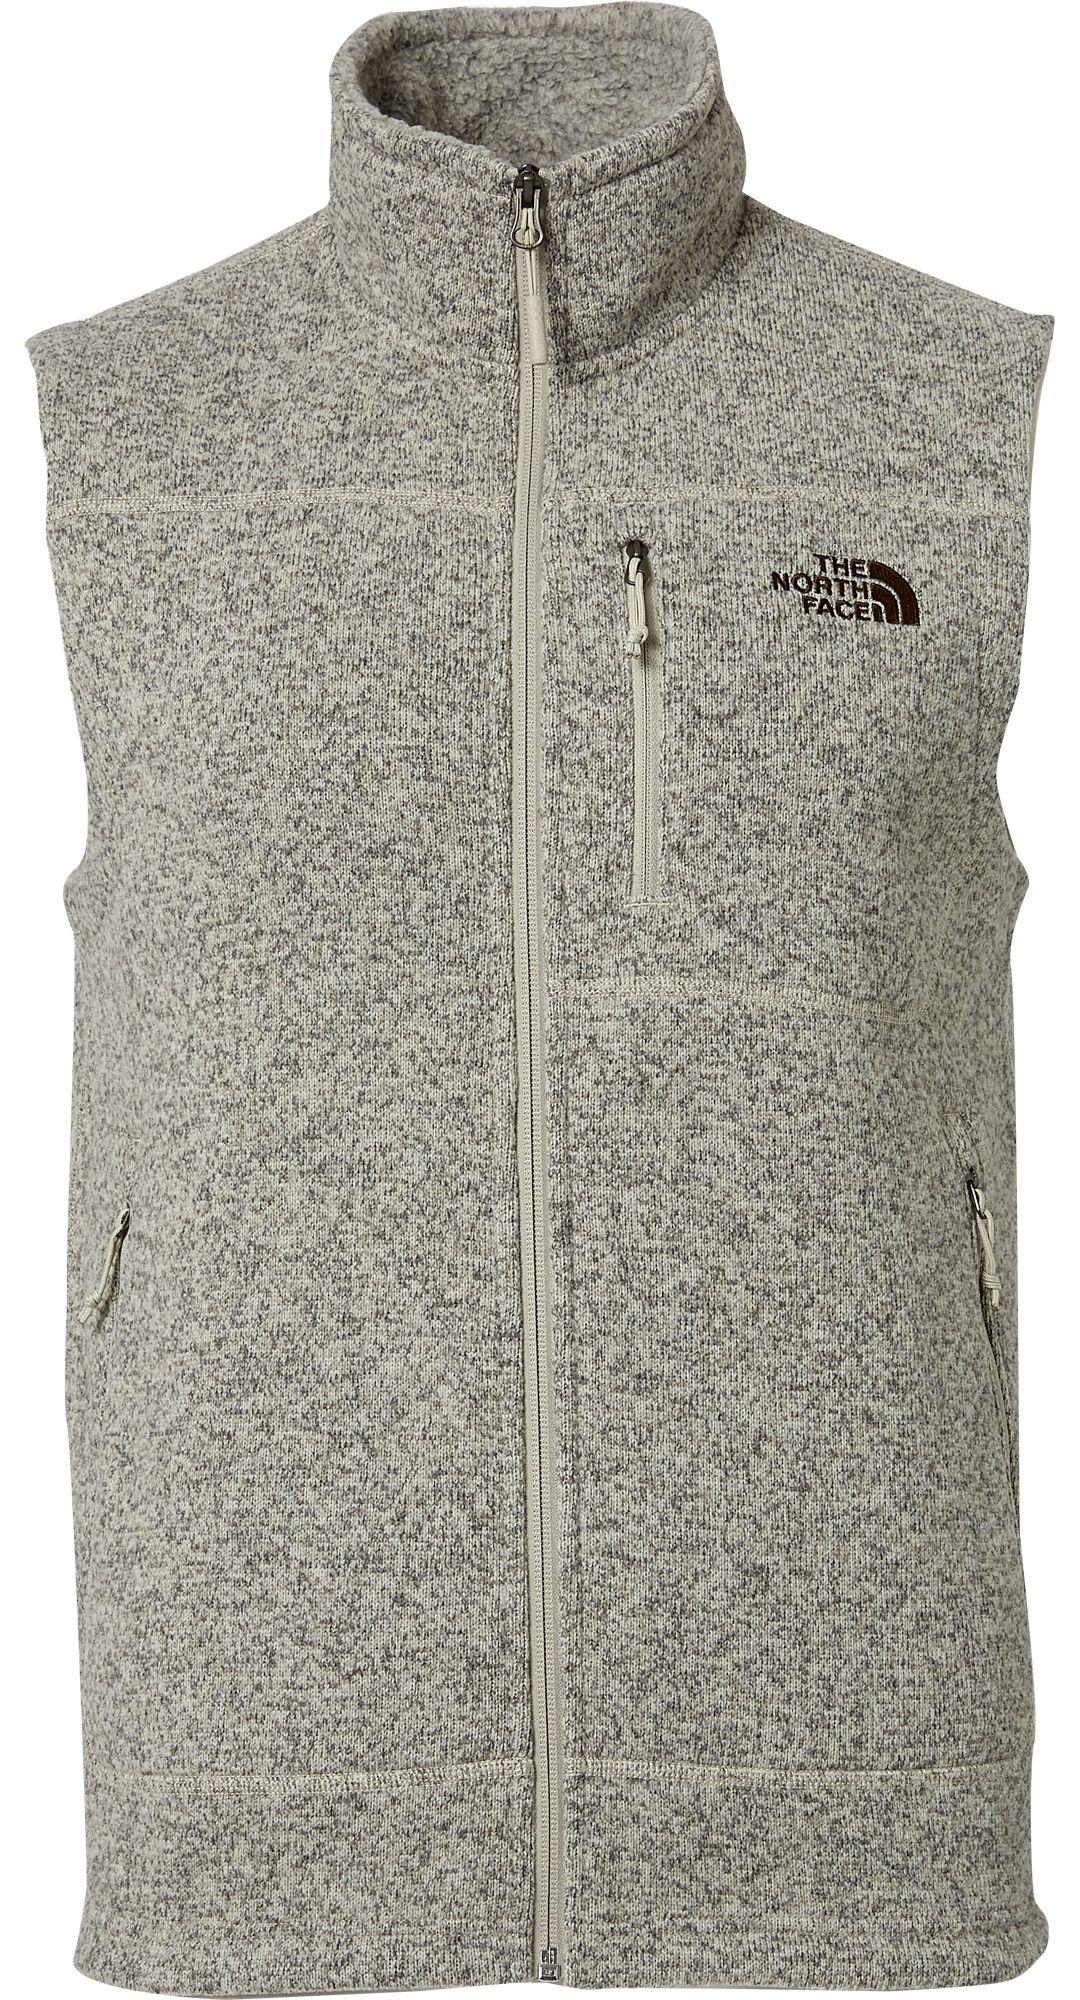 18aeeb4133341 The North Face Men's Gordon Lyons Fleece Vest | DICK'S Sporting Goods